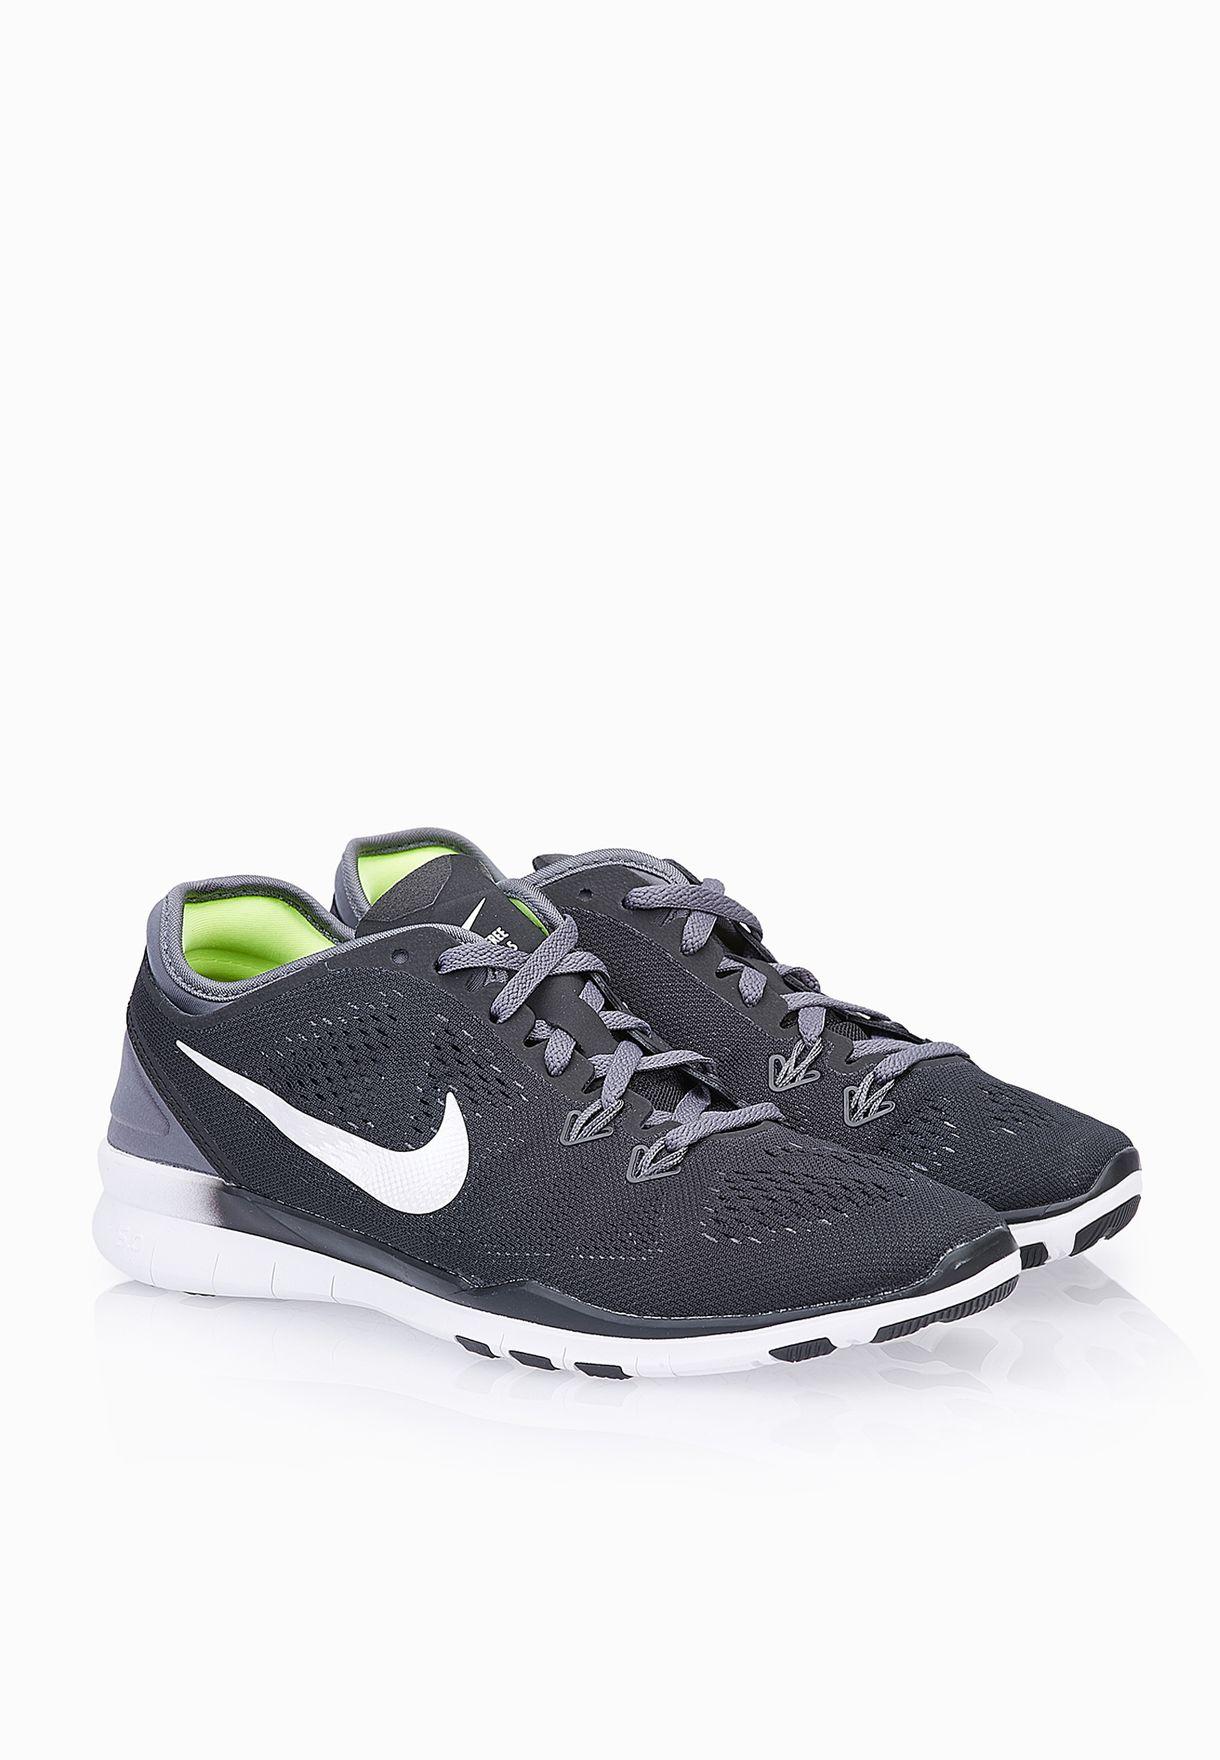 9f13b3254d53 Shop Nike black Free 5.0 TR Fit 5 704674-004 for Women in UAE ...